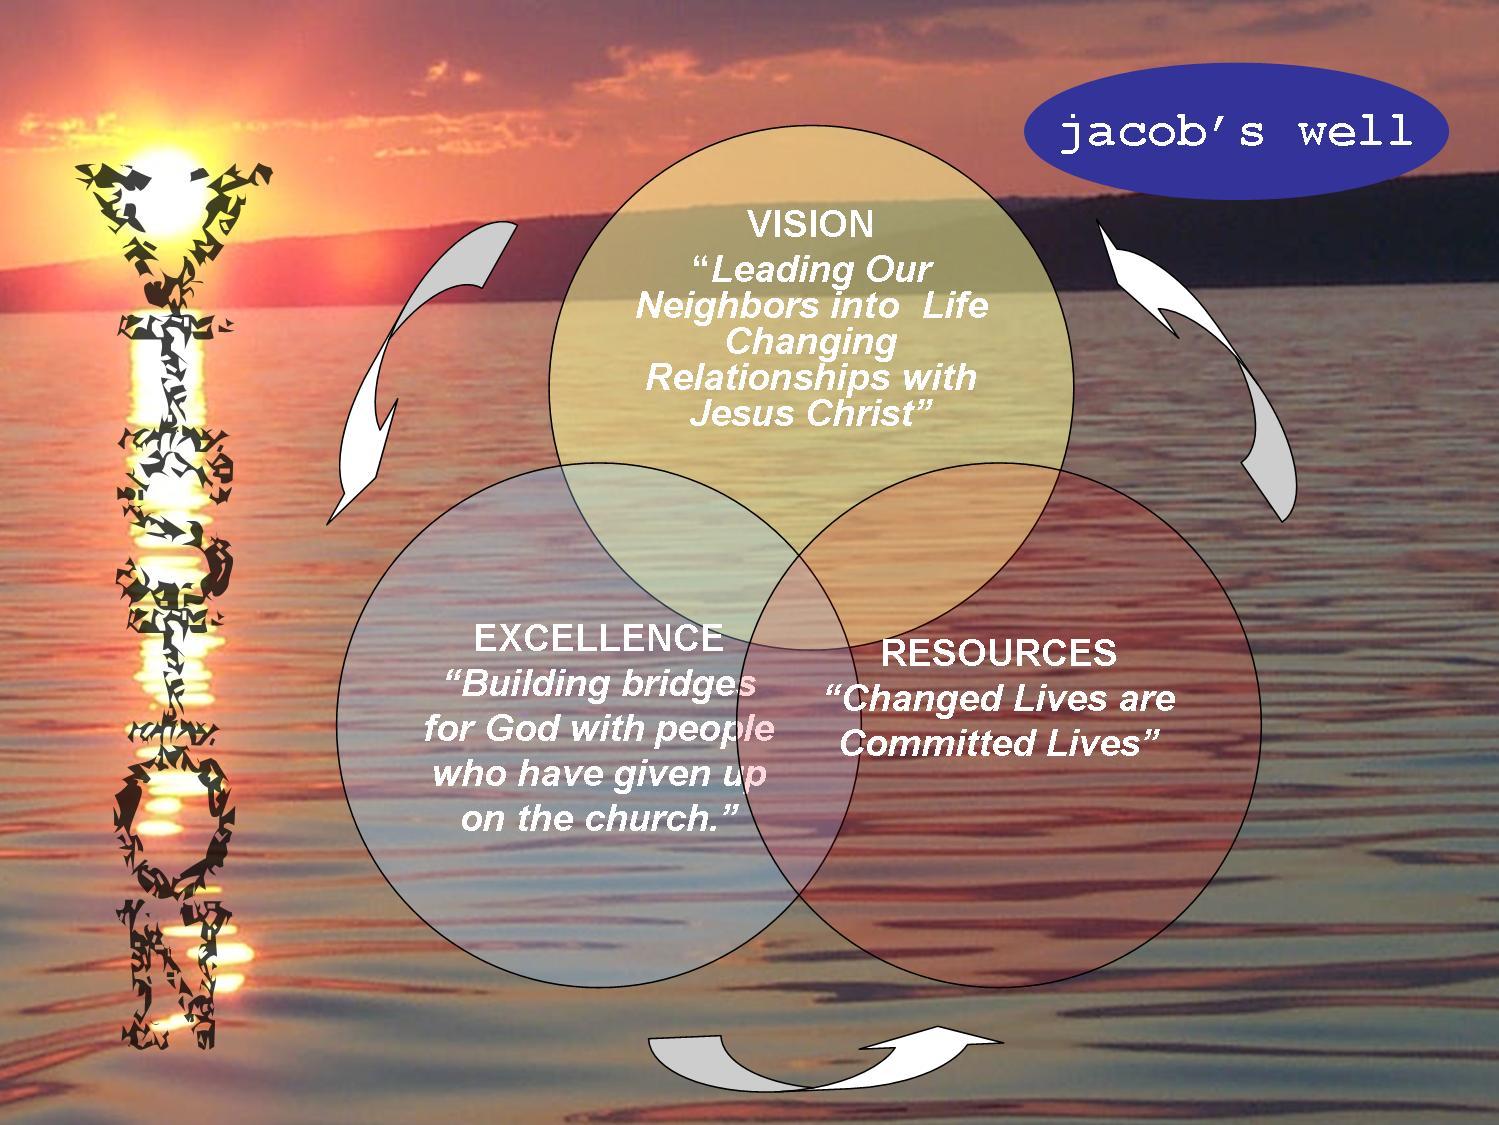 jacobs-well-vision-diagram.jpg